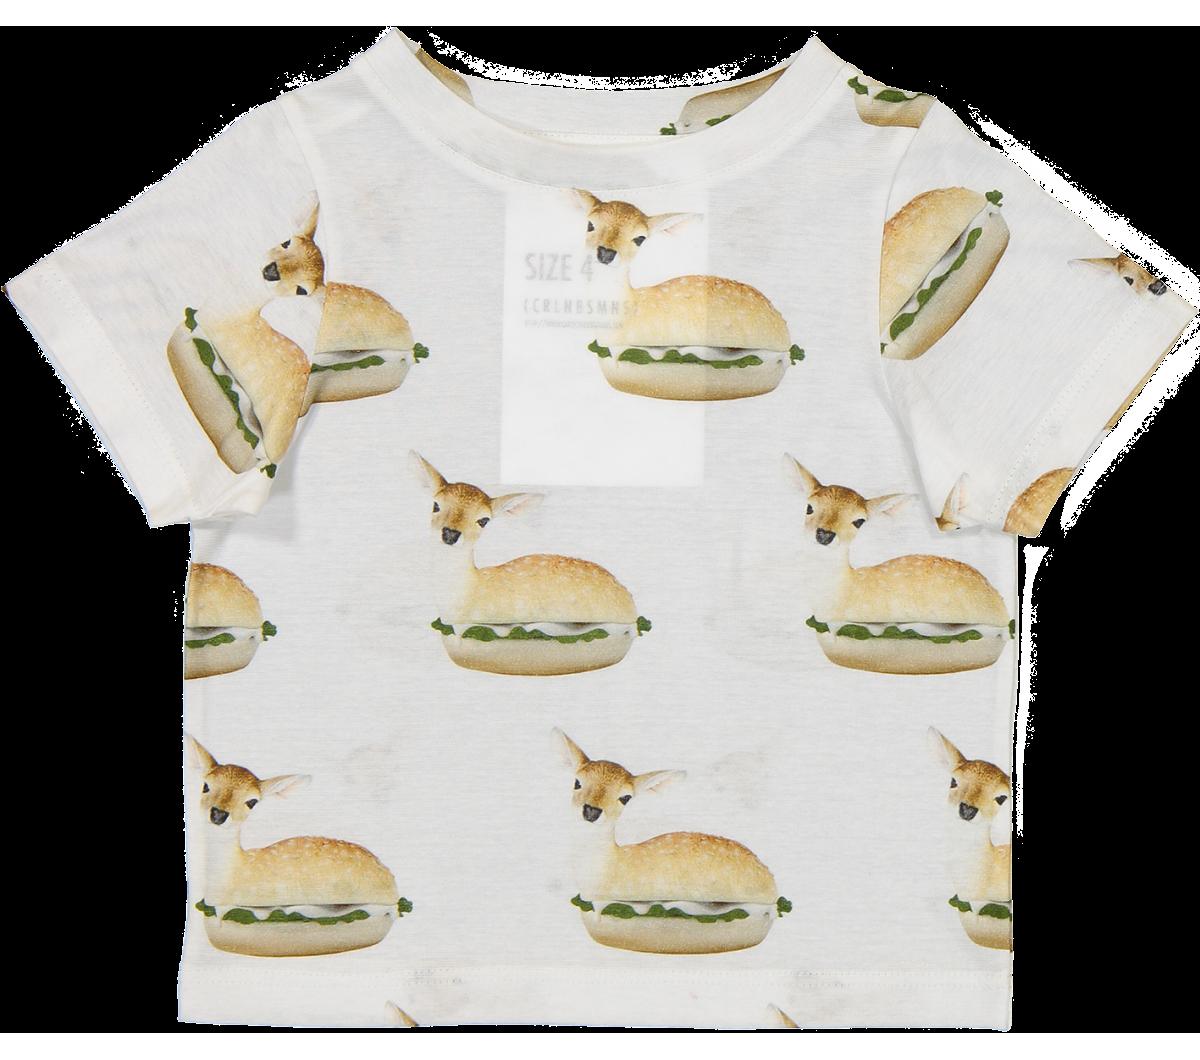 Caroline Bosmans Dee Licious T Shirt Bambi Burger Orange Mayonn